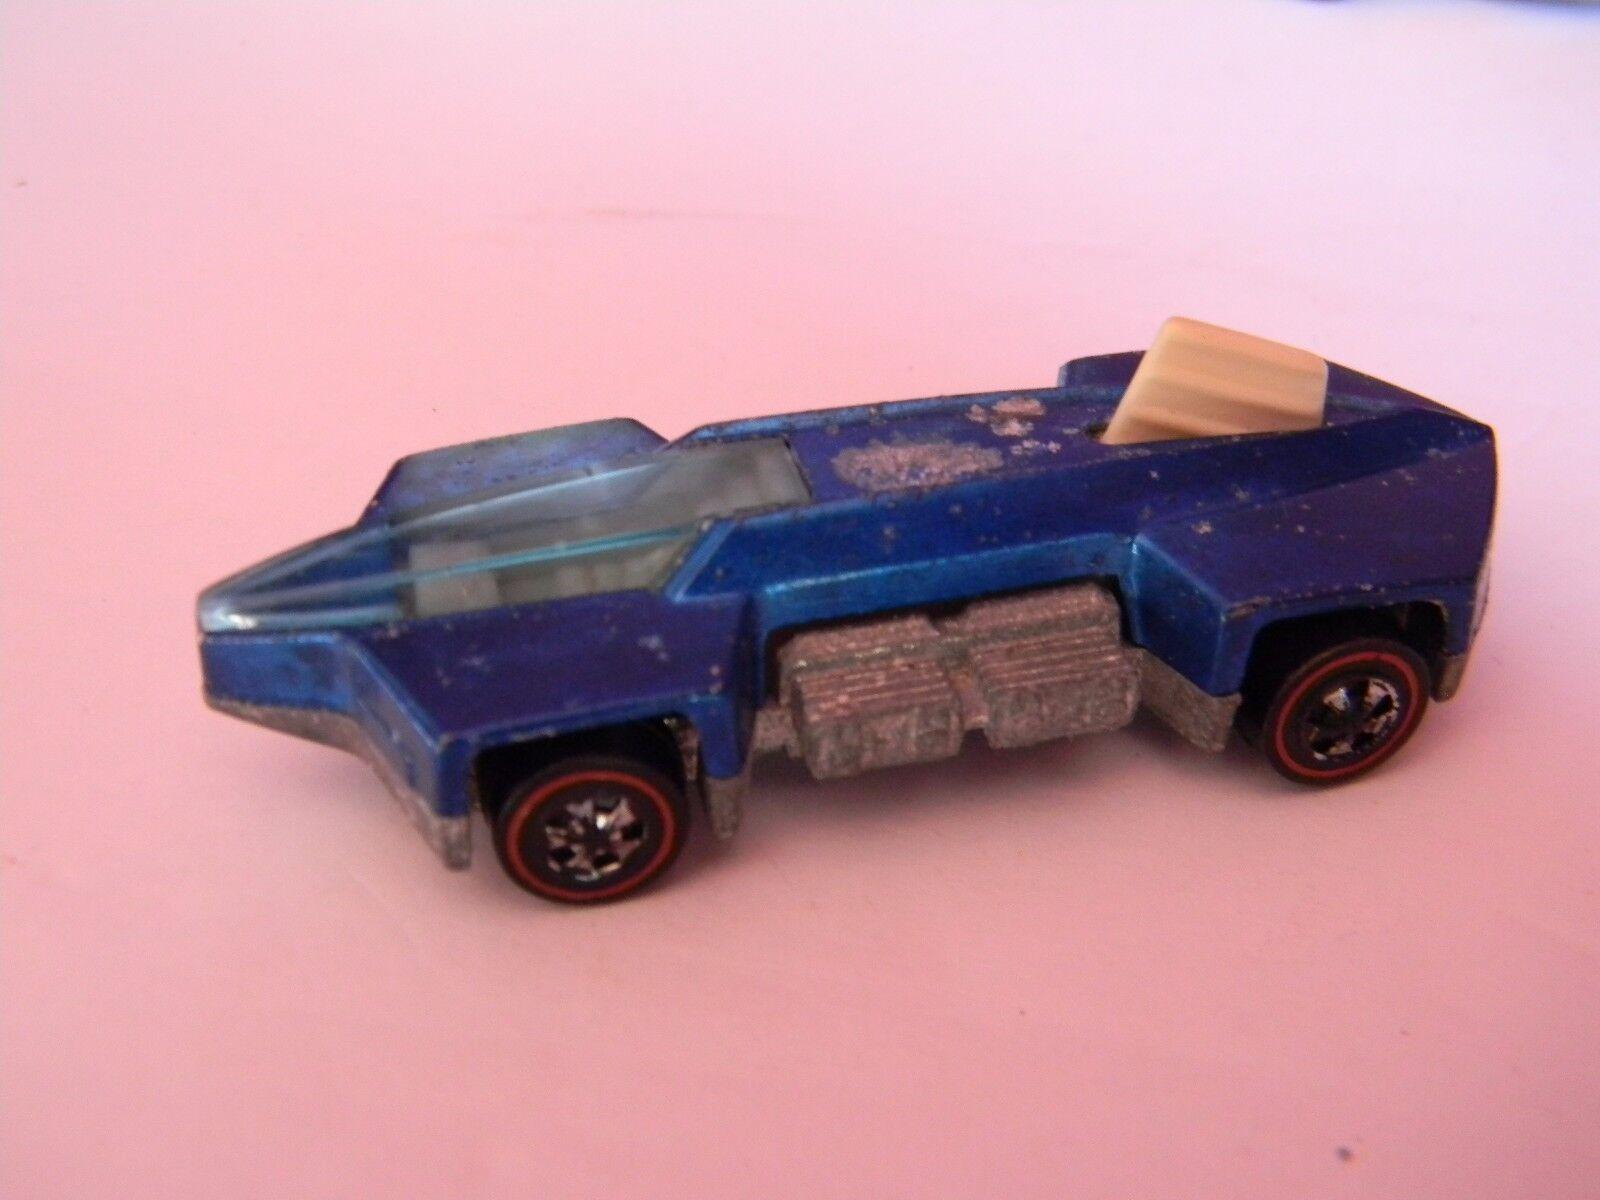 1971 - what-4 - heiß wheels-rare-original locker rotline-vhtf-Blau vari.